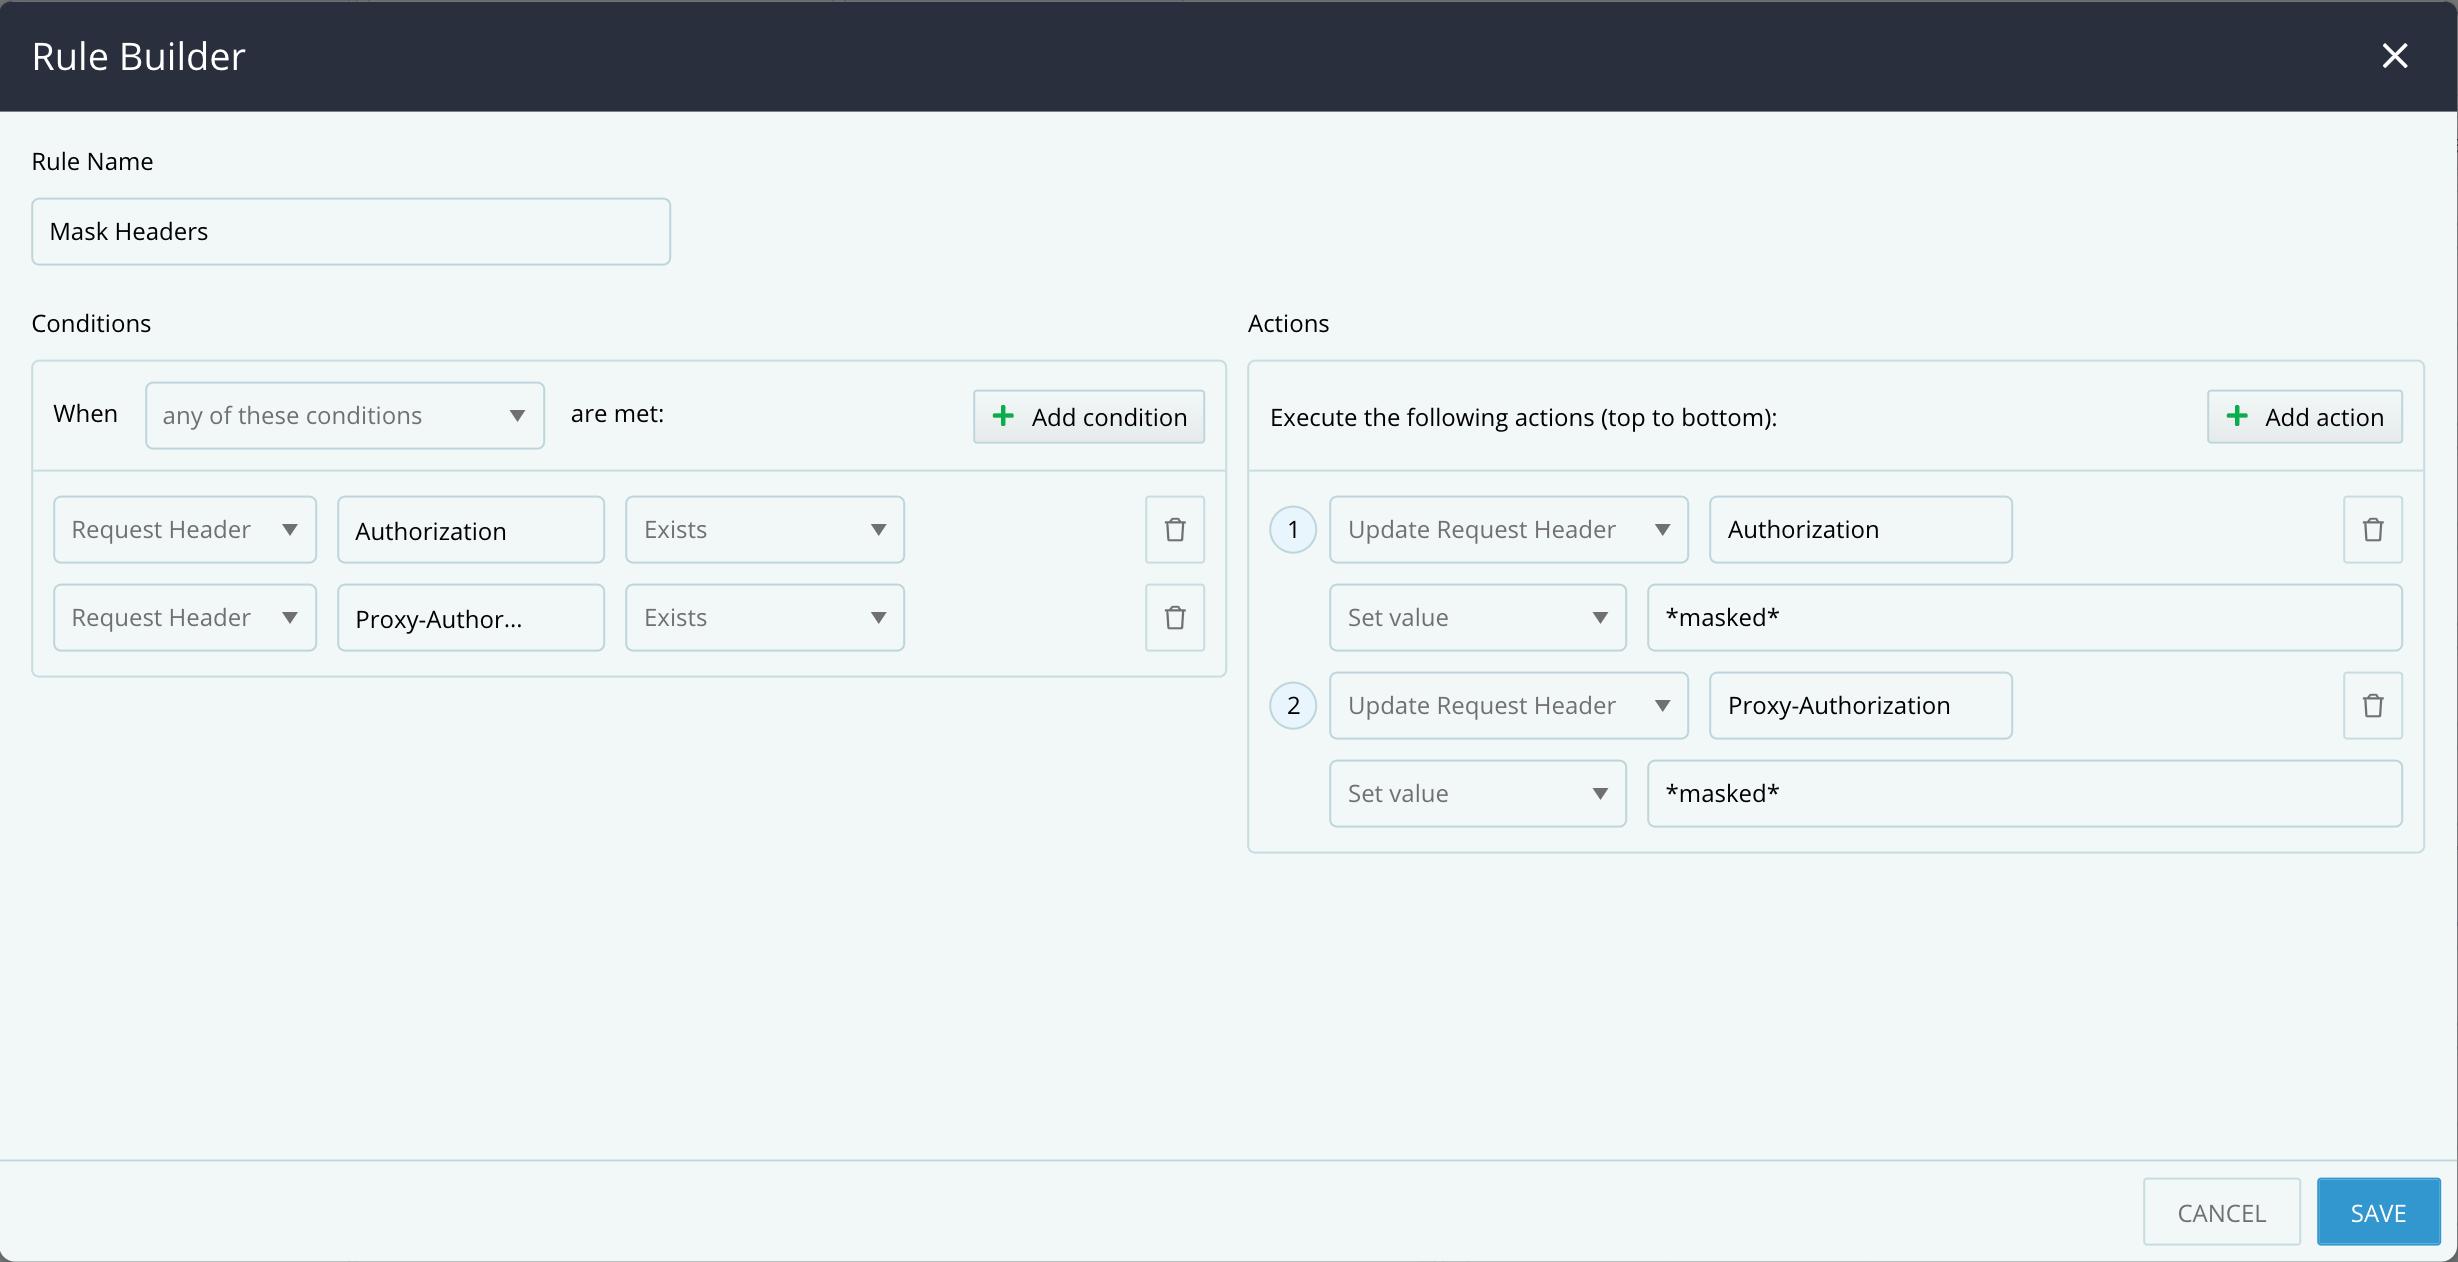 Rule Builder - Update Request Header